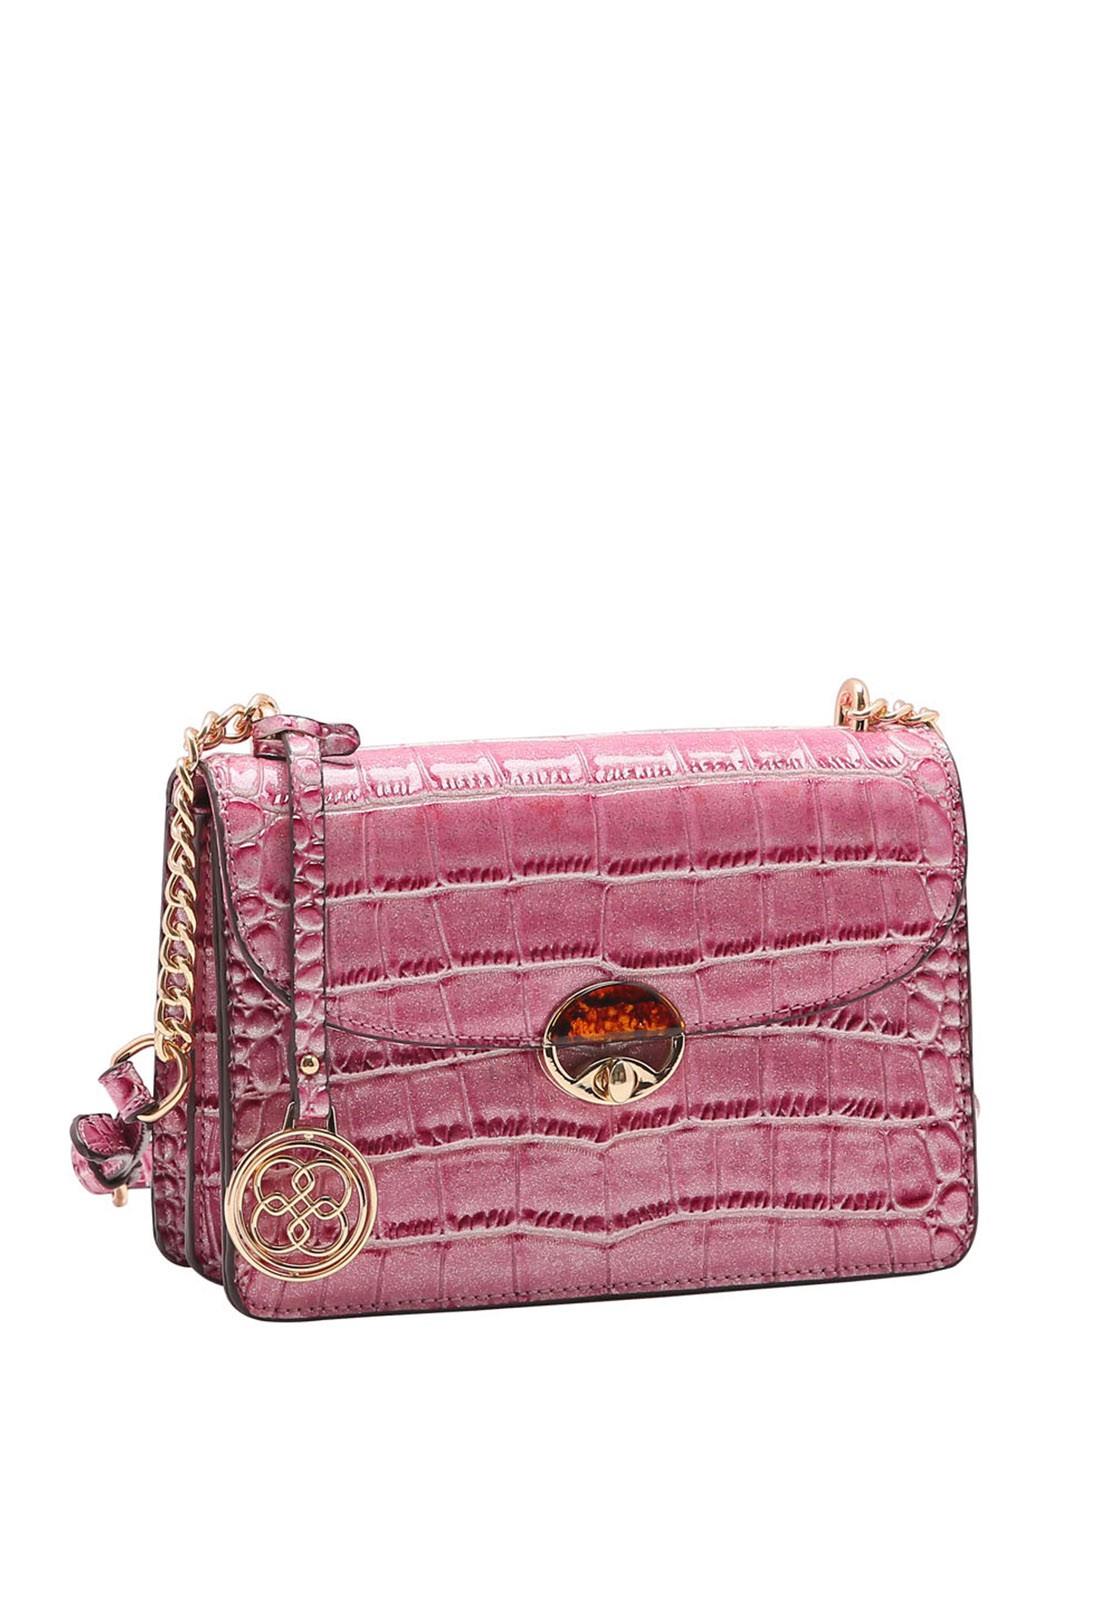 Bolsa Feminina Chenson Croco Gliter Transversal 3483193